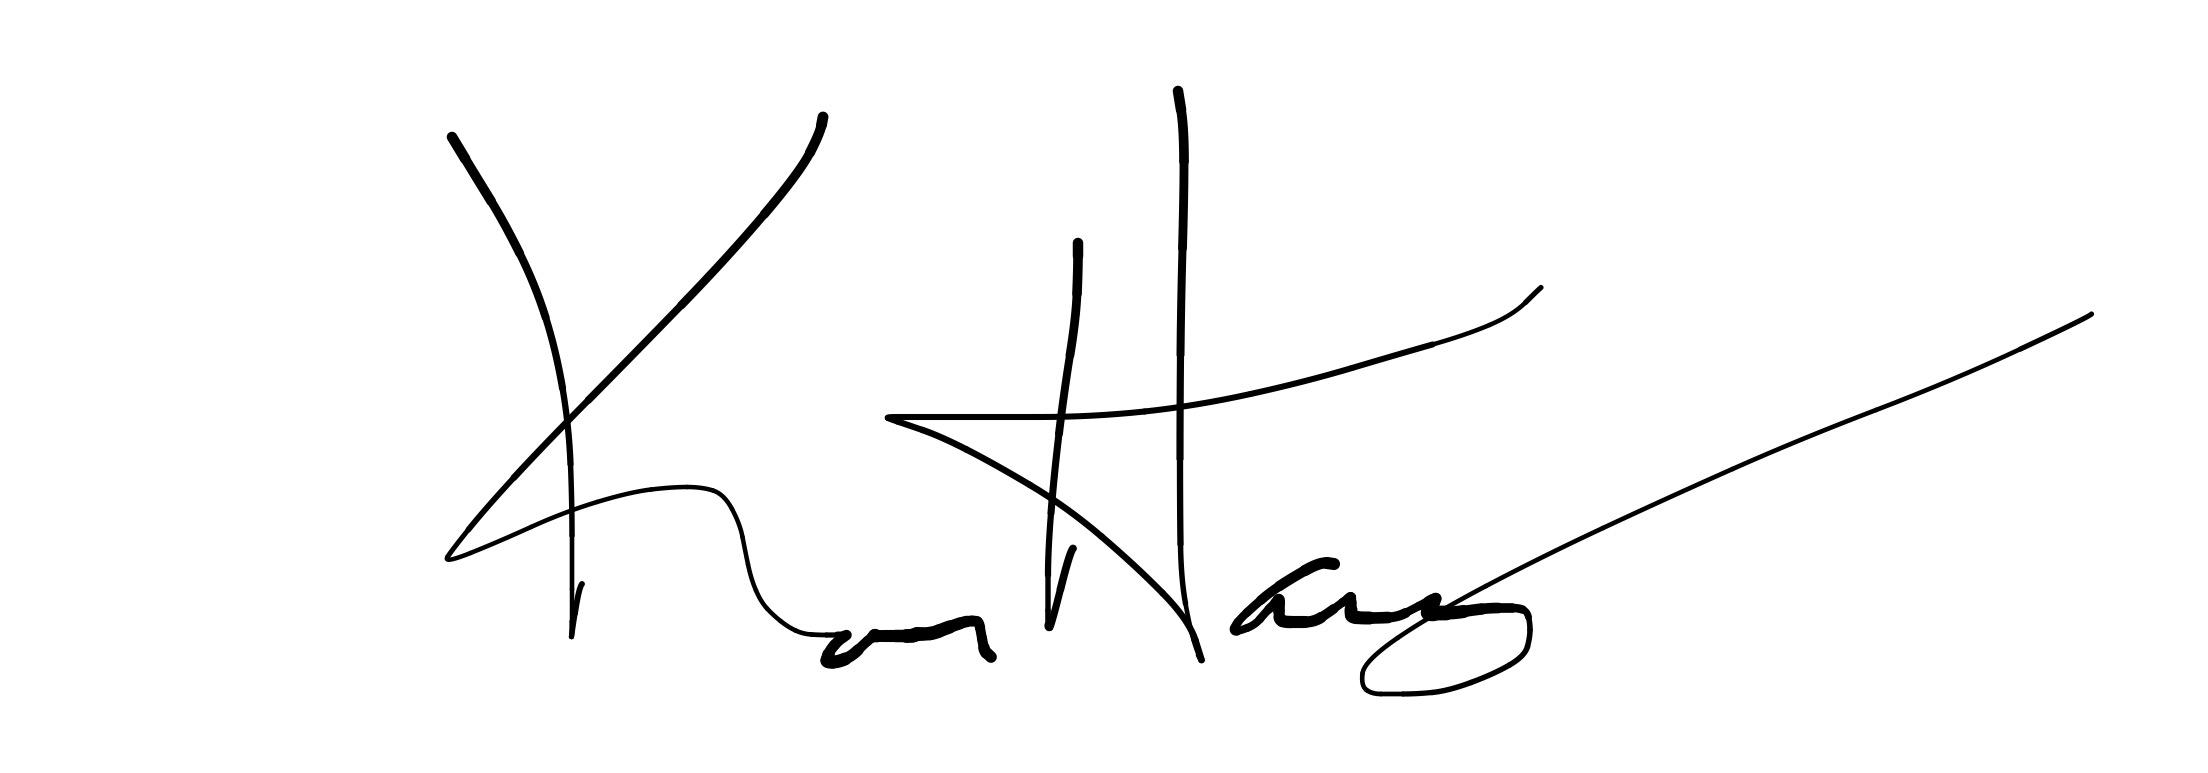 keelan harvey's Signature